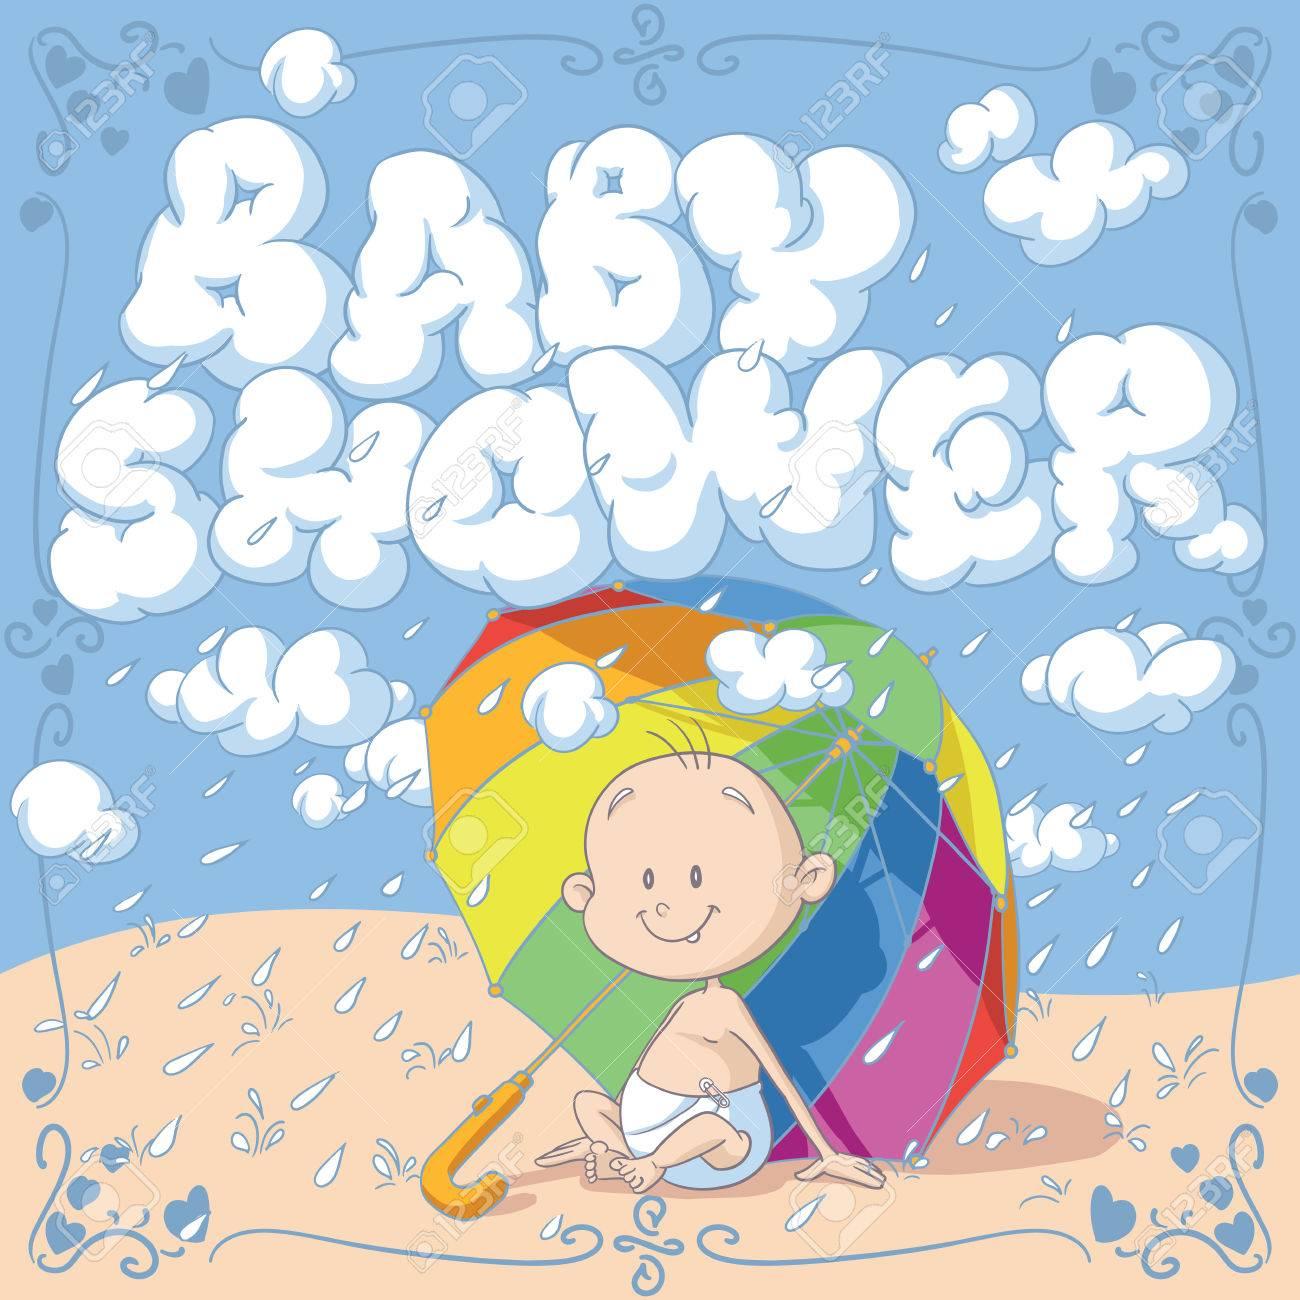 Baby shower vector cartoon invitation royalty free cliparts vectors baby shower vector cartoon invitation stock vector 41187708 stopboris Choice Image